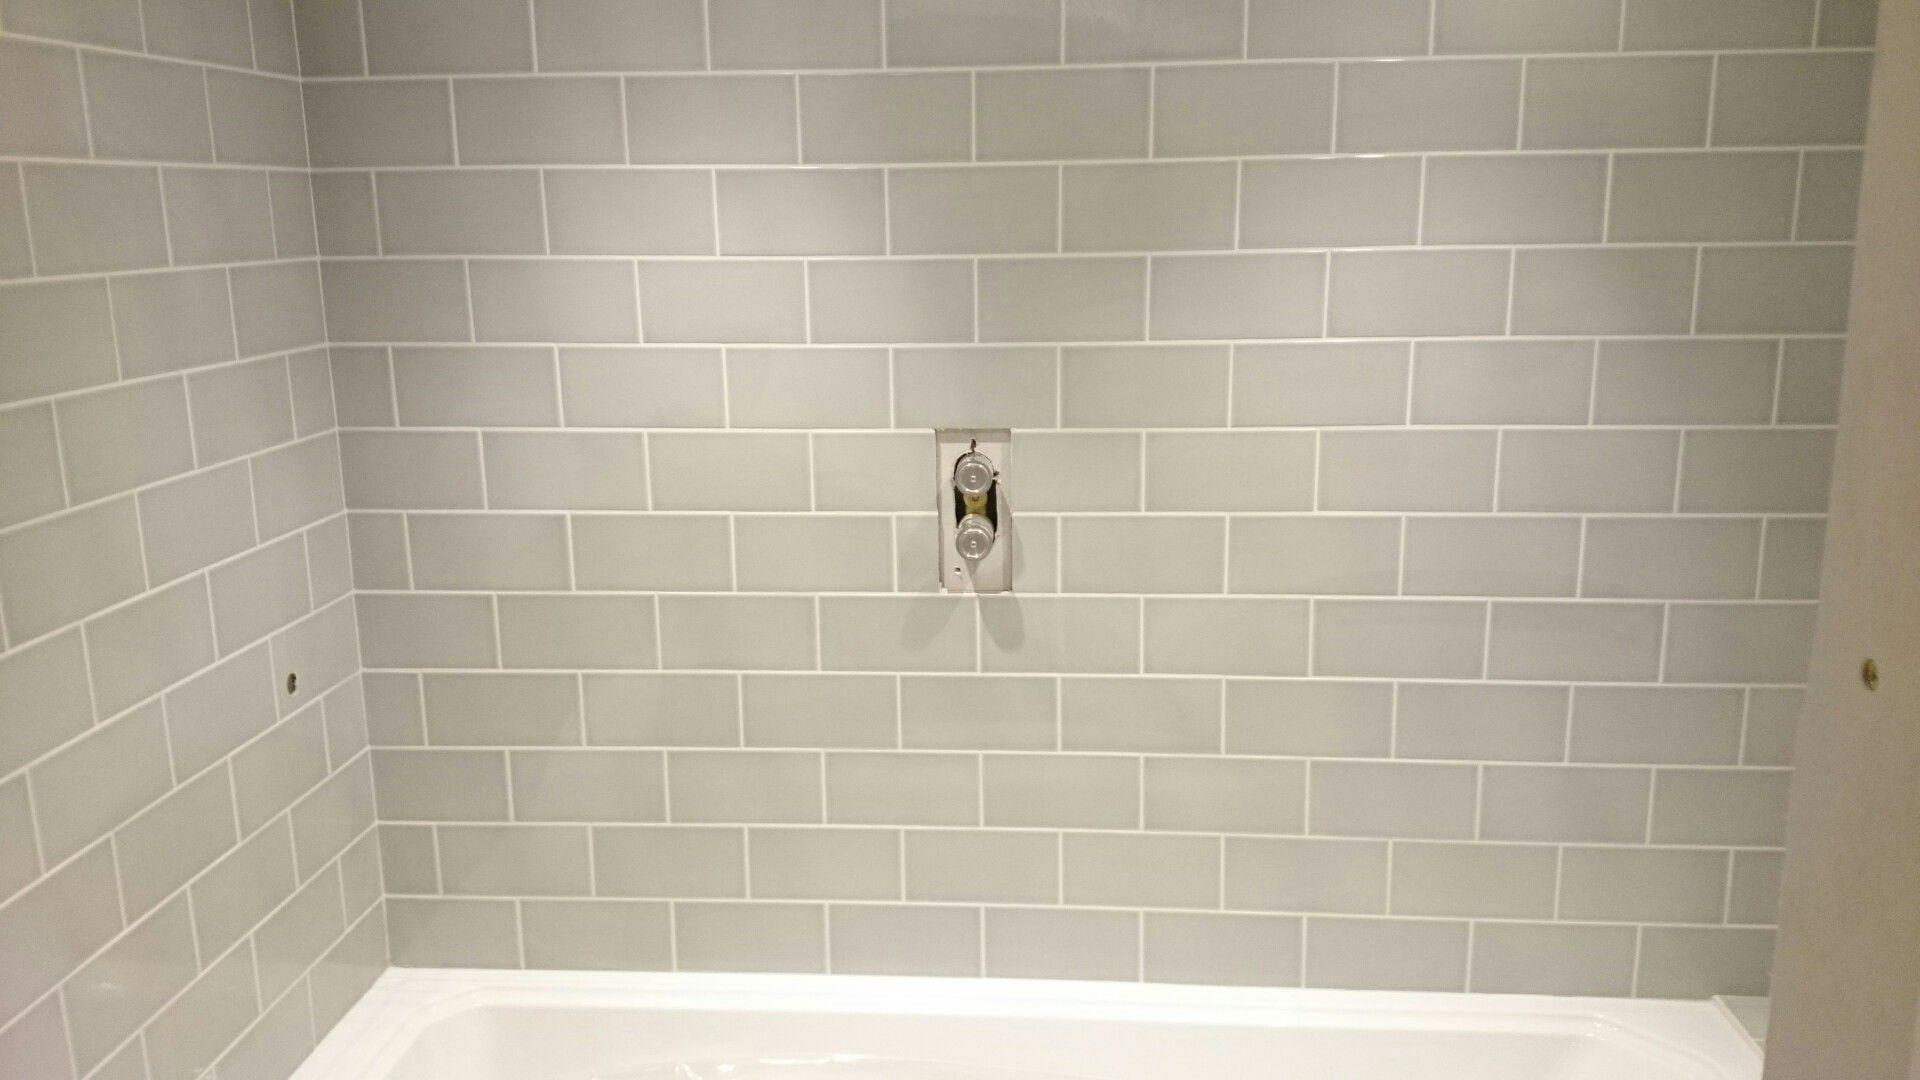 Our New Bathroom Topps Tiles Astrea Sage Crackle Metro With White Grout Bathroom Inspiration Bathroom Bathroom Renos